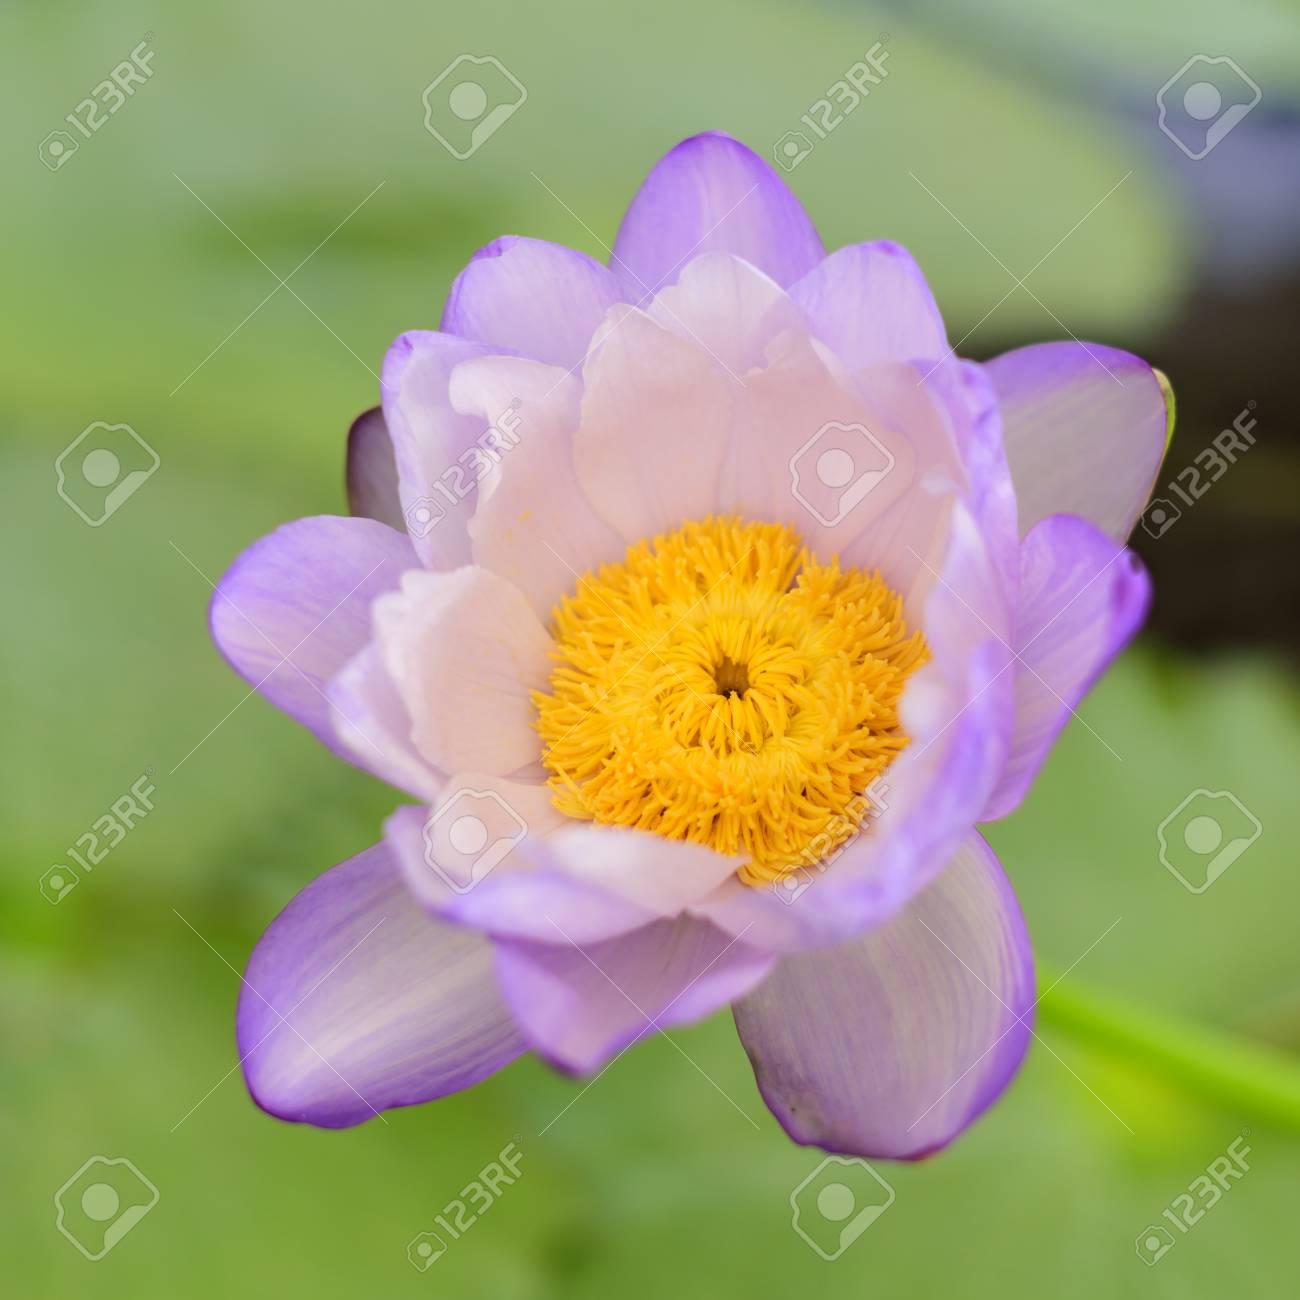 Nice blooming lotus flower at pool stock photo picture and royalty nice blooming lotus flower at pool stock photo 85324570 izmirmasajfo